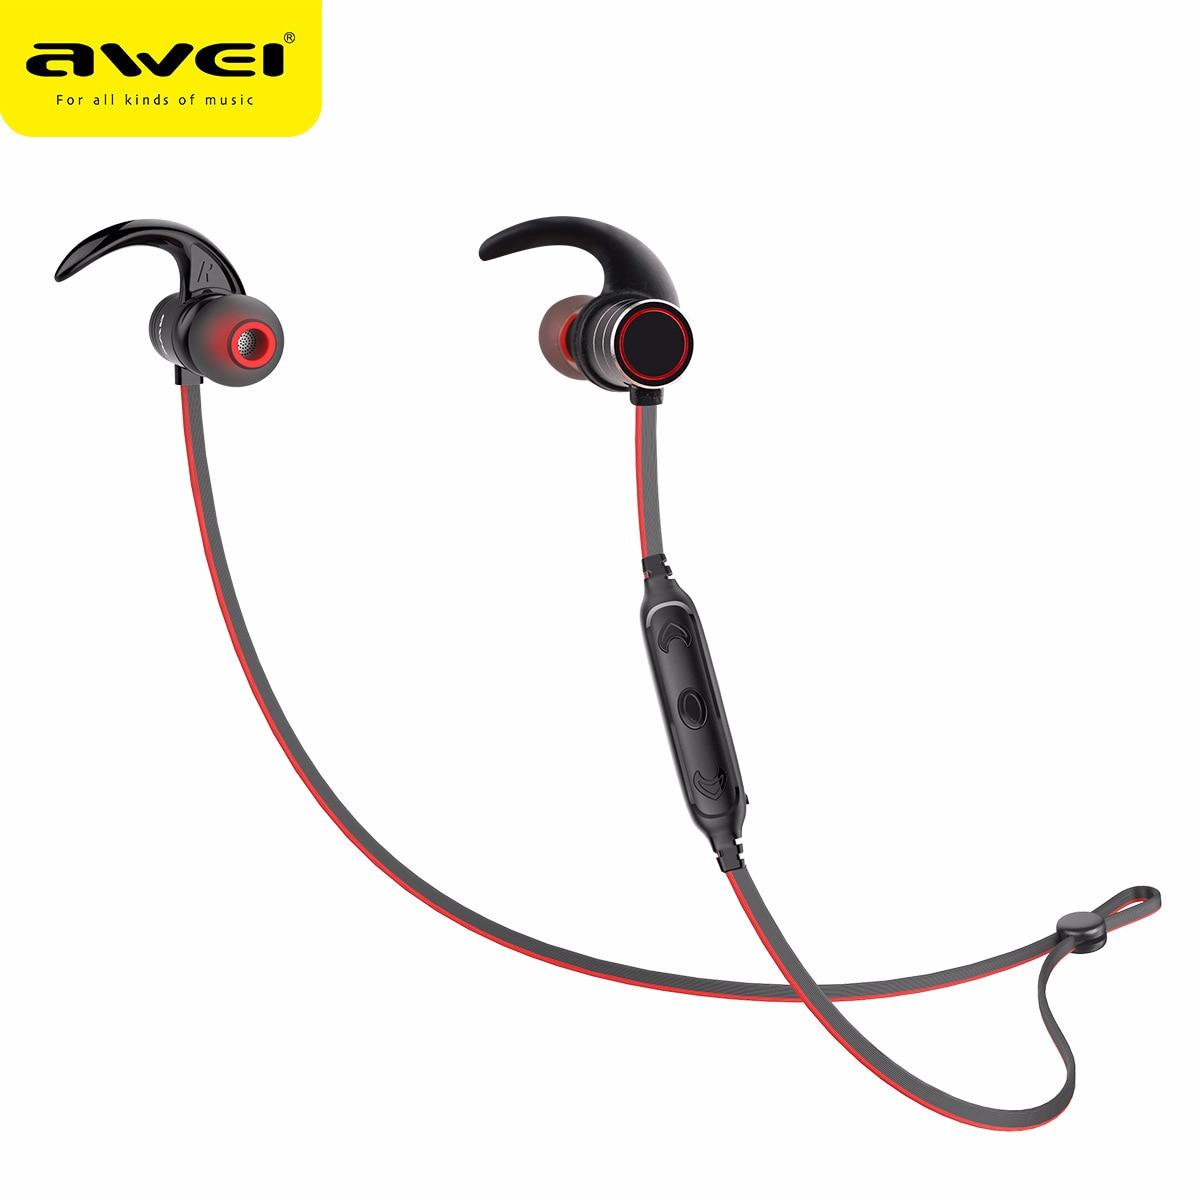 2018 AWEI AK9 Wireless Deportes Bluetooth Auricular Magnético IPX4 Impermeable Auriculares para IPhone para Huawei Teléfonos Inteligentes